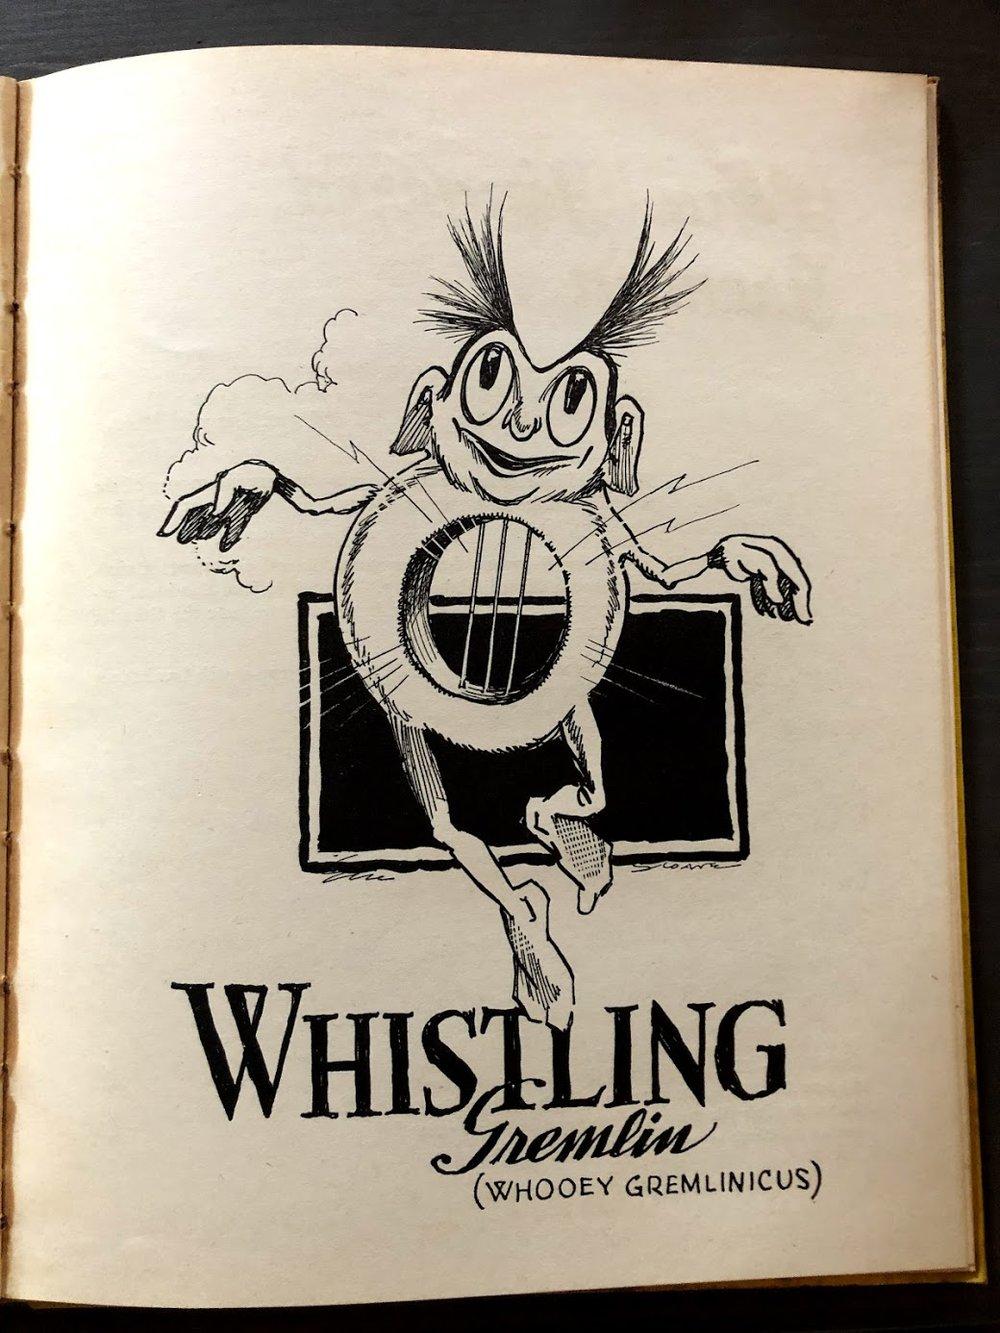 Whistling